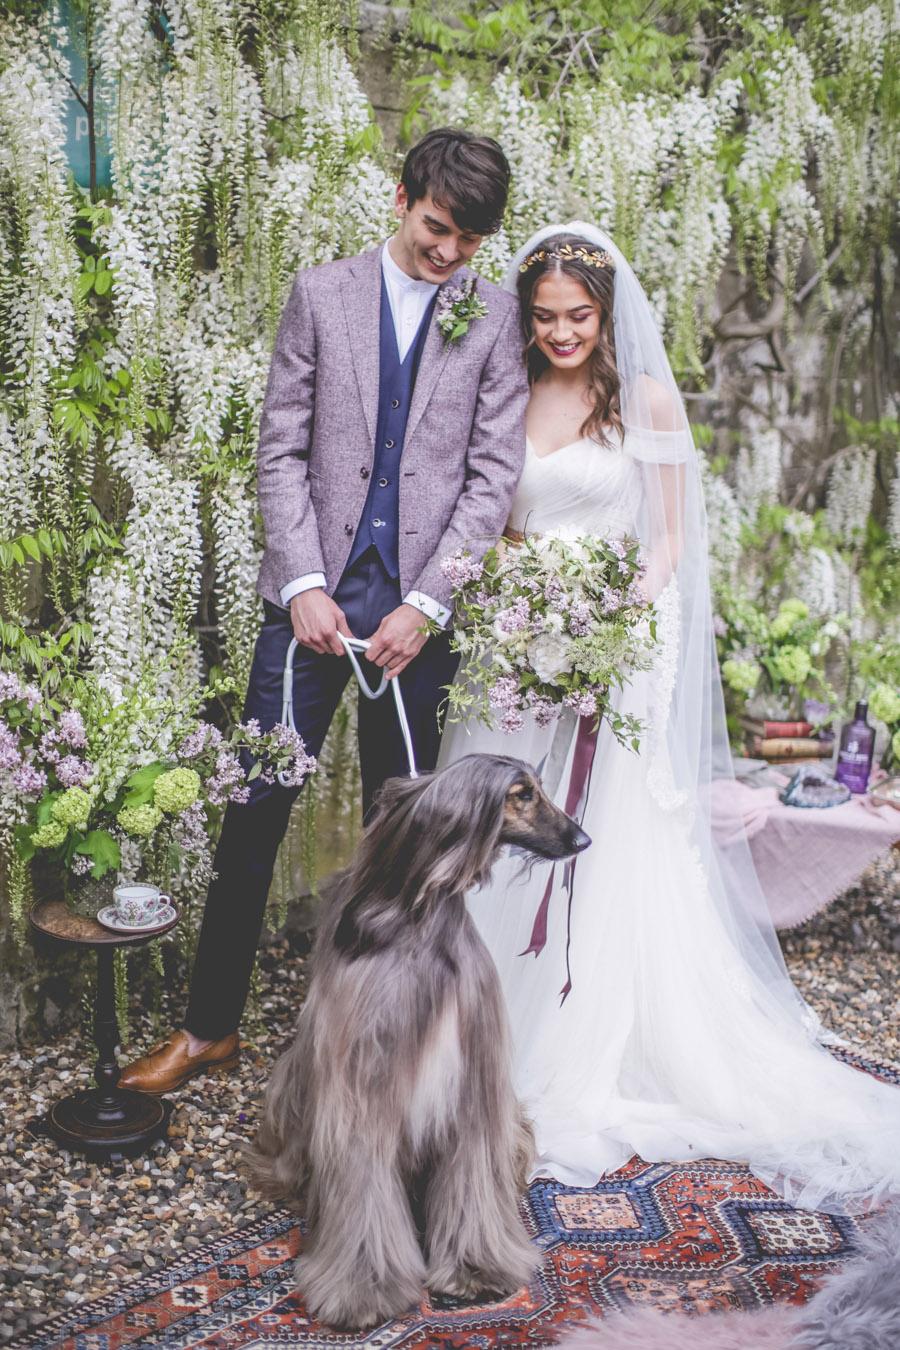 Eshott Hall wedding inspiration, credit Sean Elliott Photography (11)